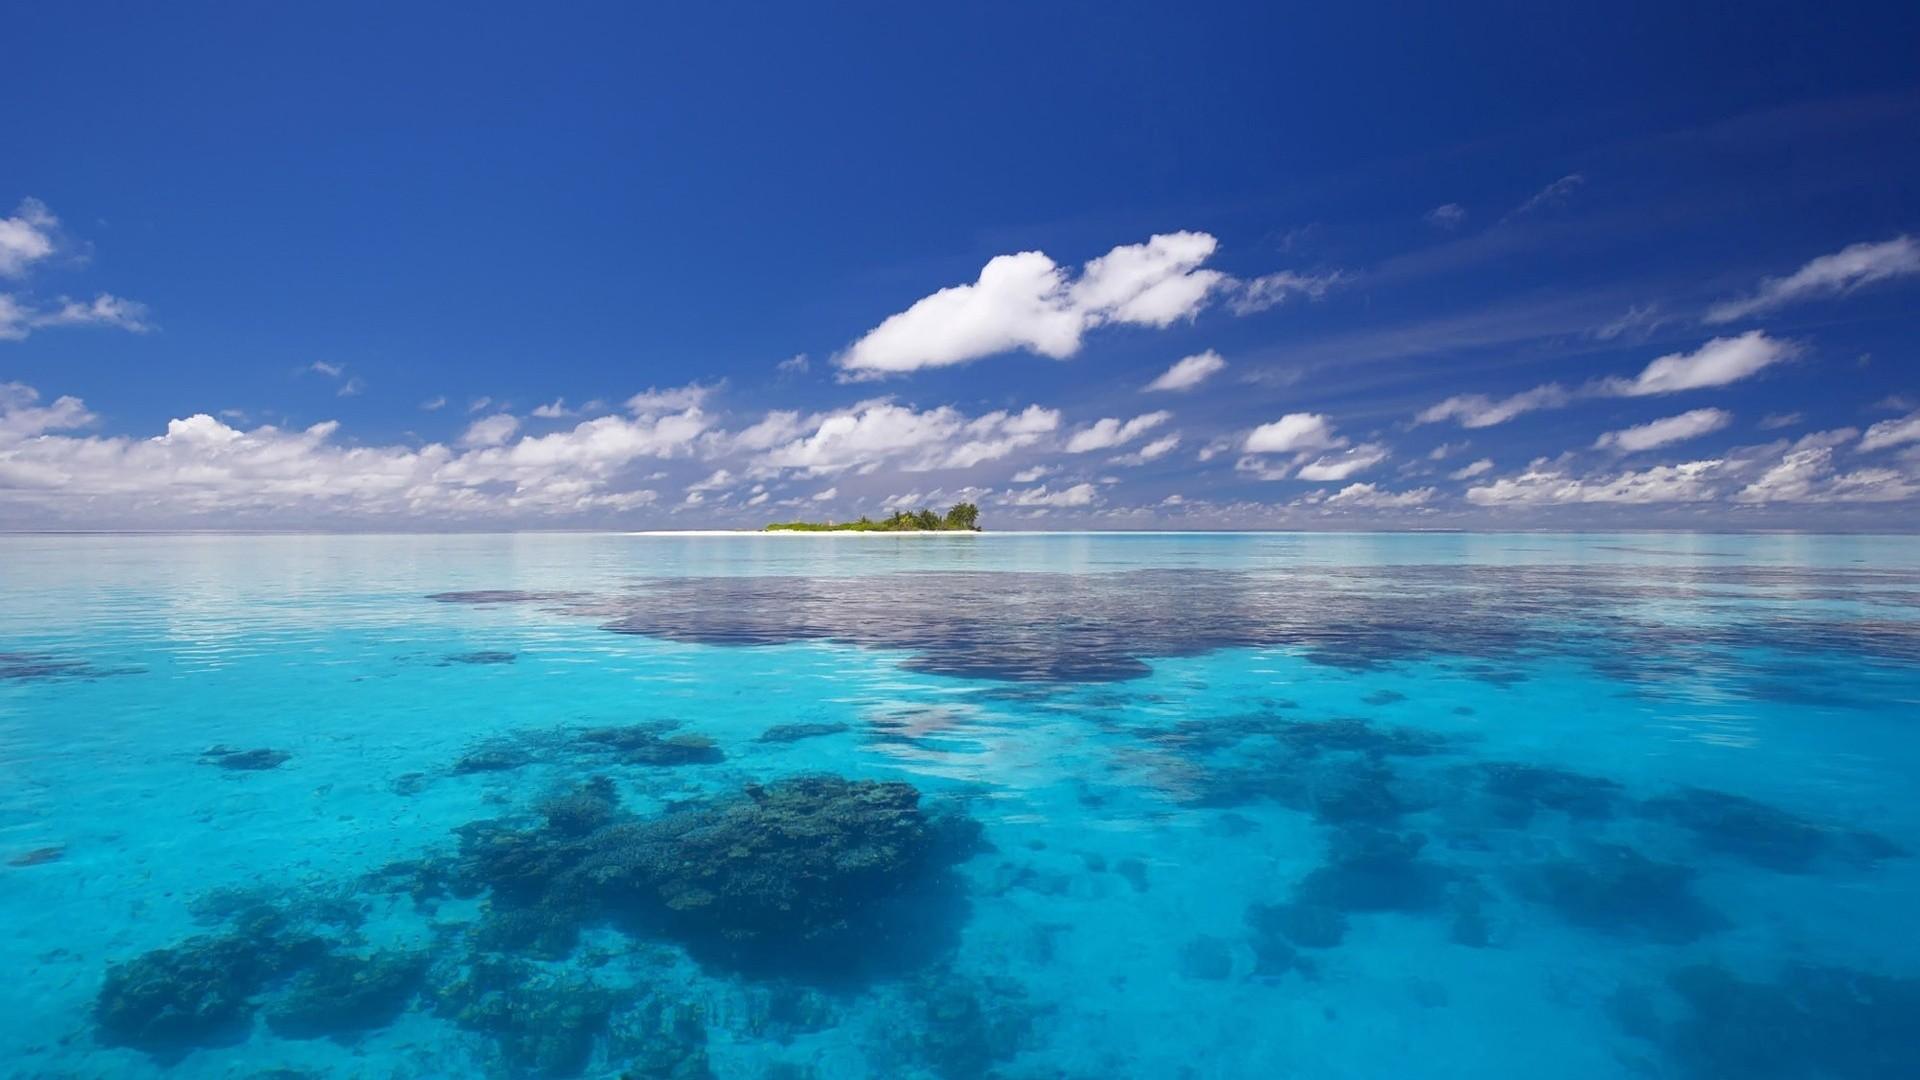 Ocean Reef Wallpaper 1920x1080 Ocean Reef Skyscapes 1920x1080